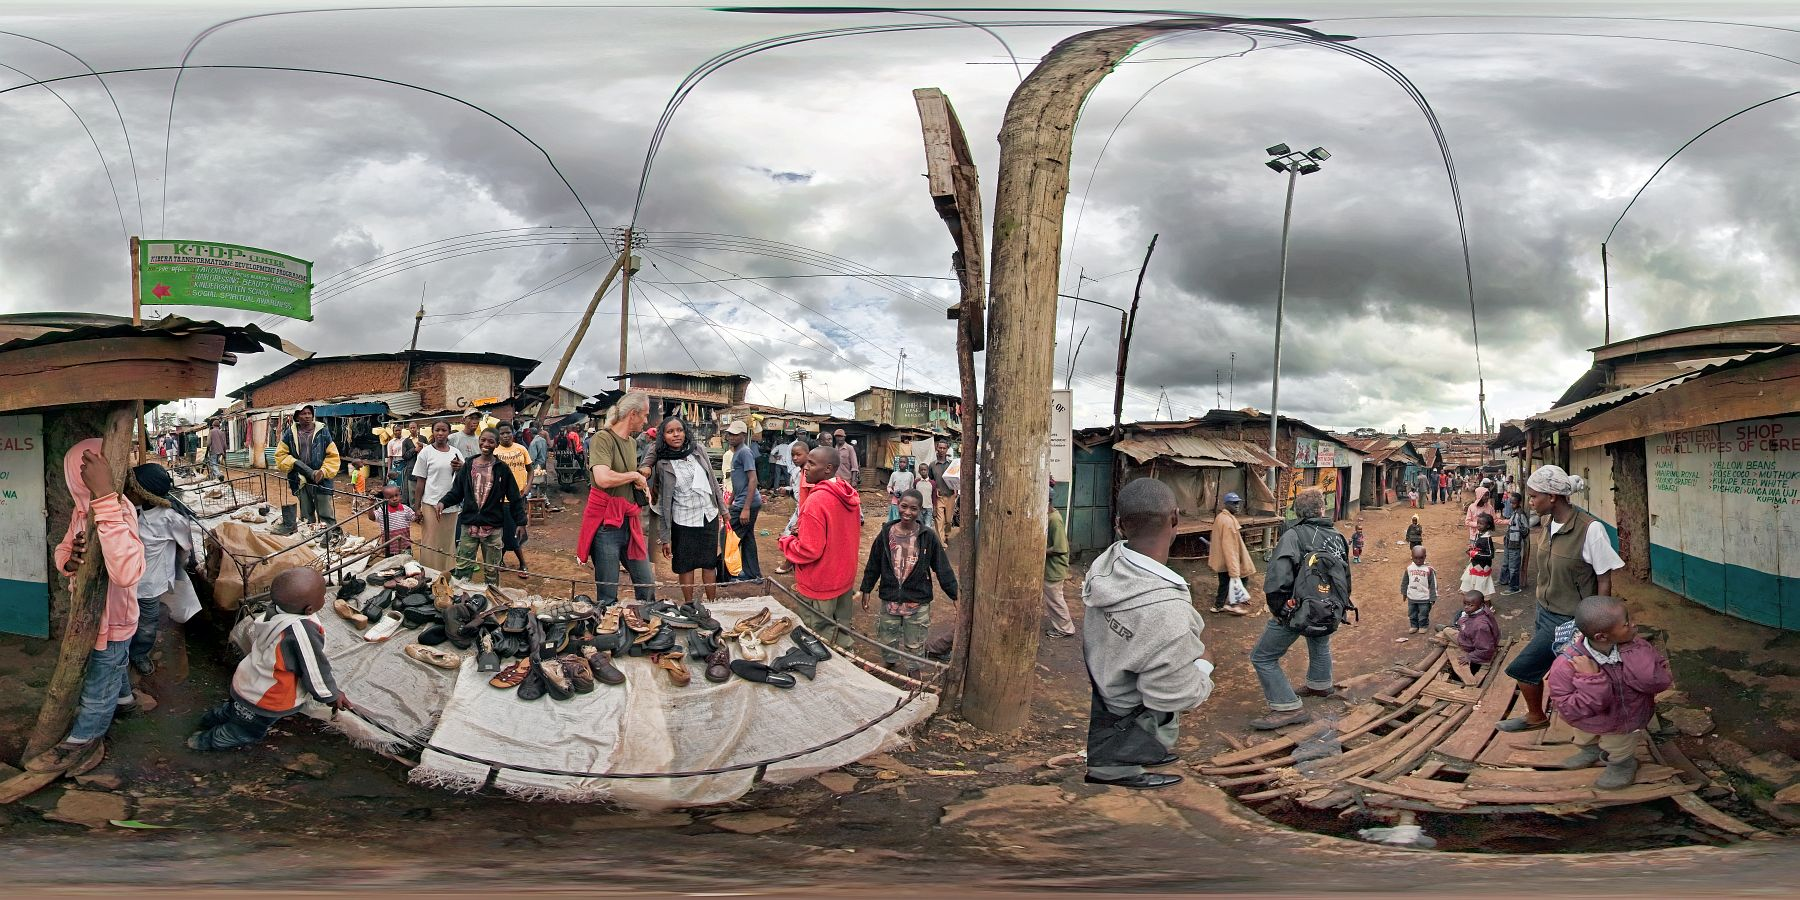 Panorama Kenia Nairobi Kibera Slum